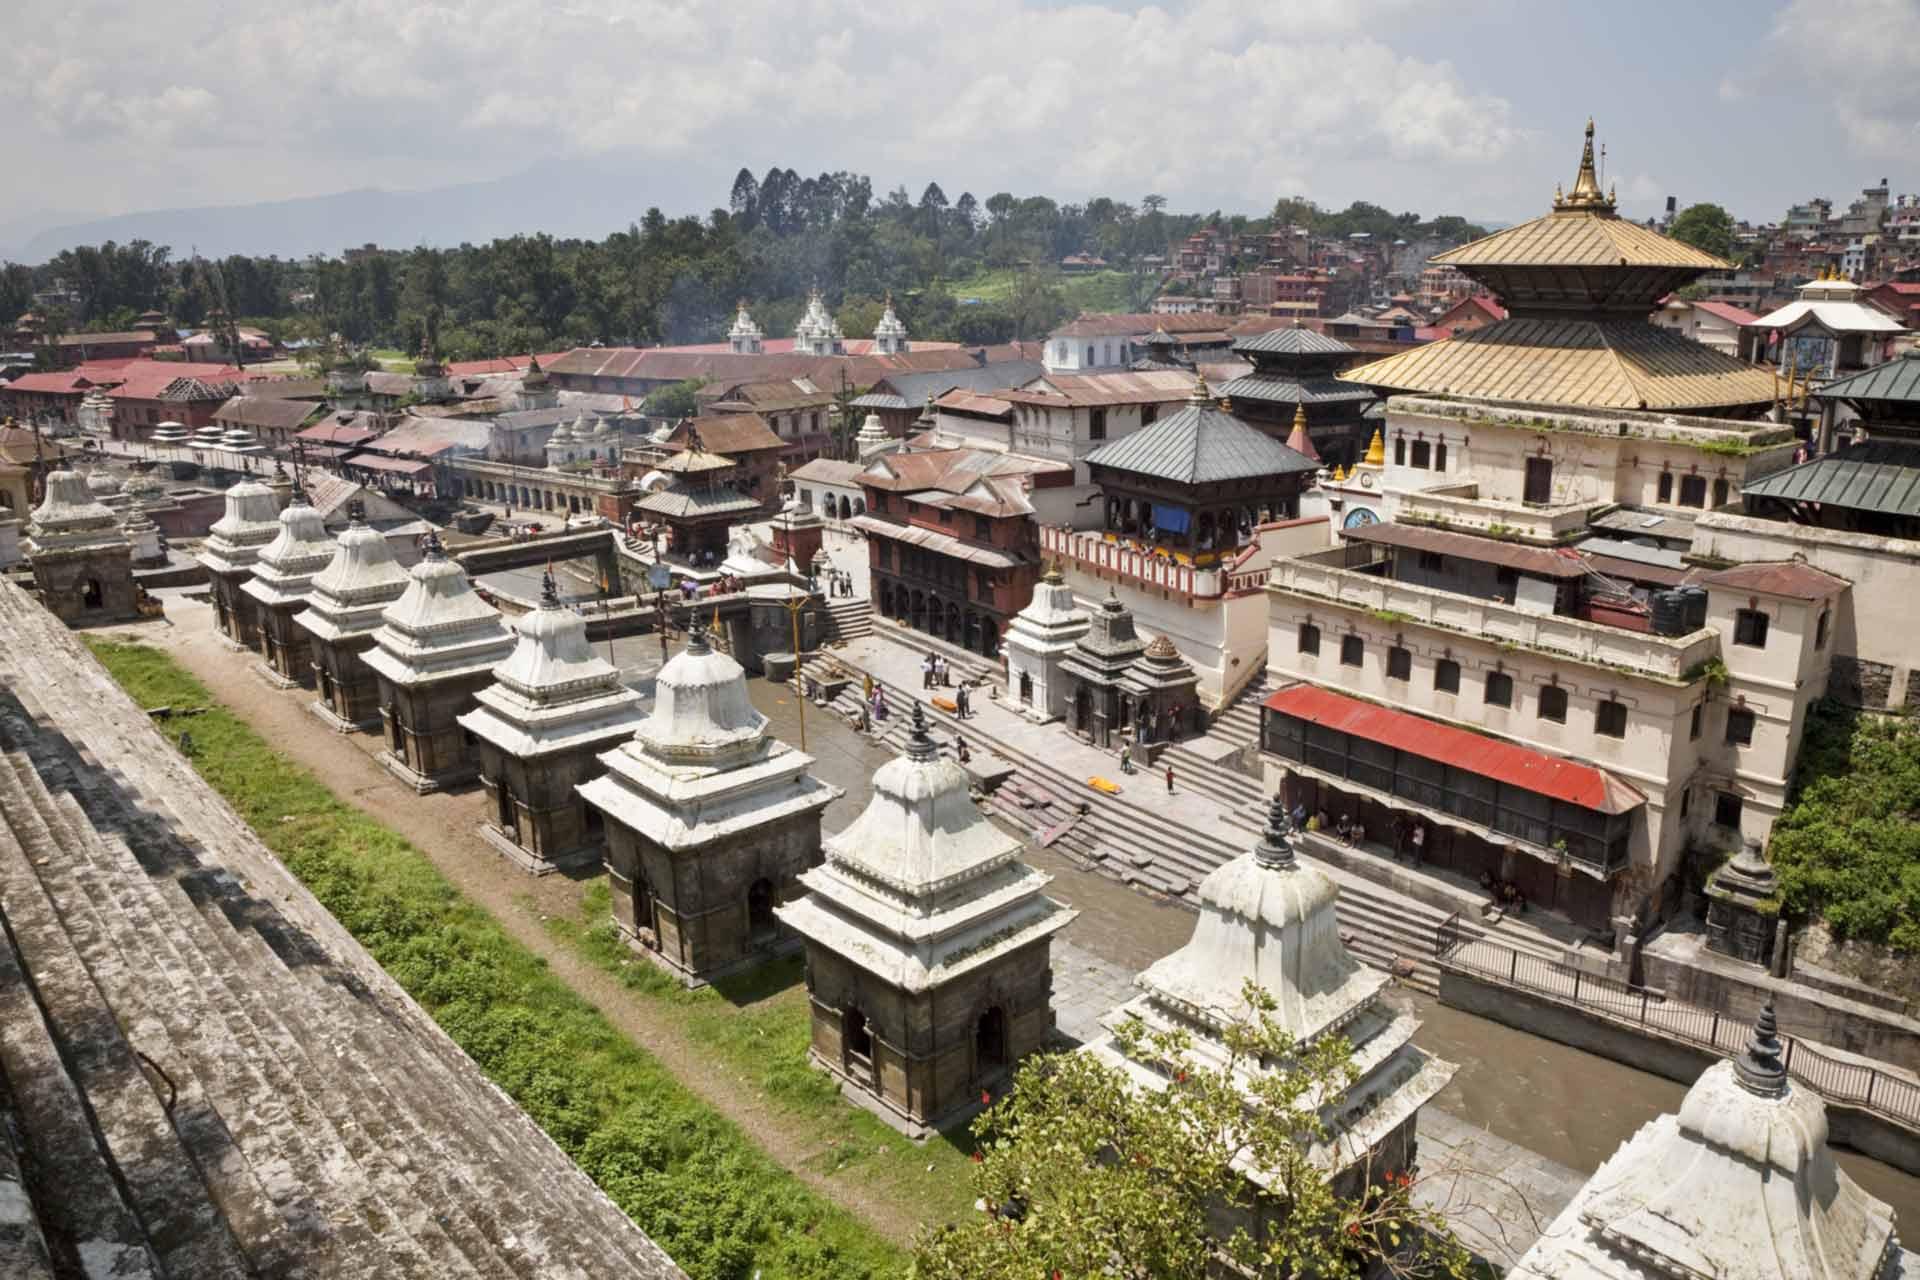 Taste of Nepal - Pashupatinath Temple, Kathmandu, Nepal